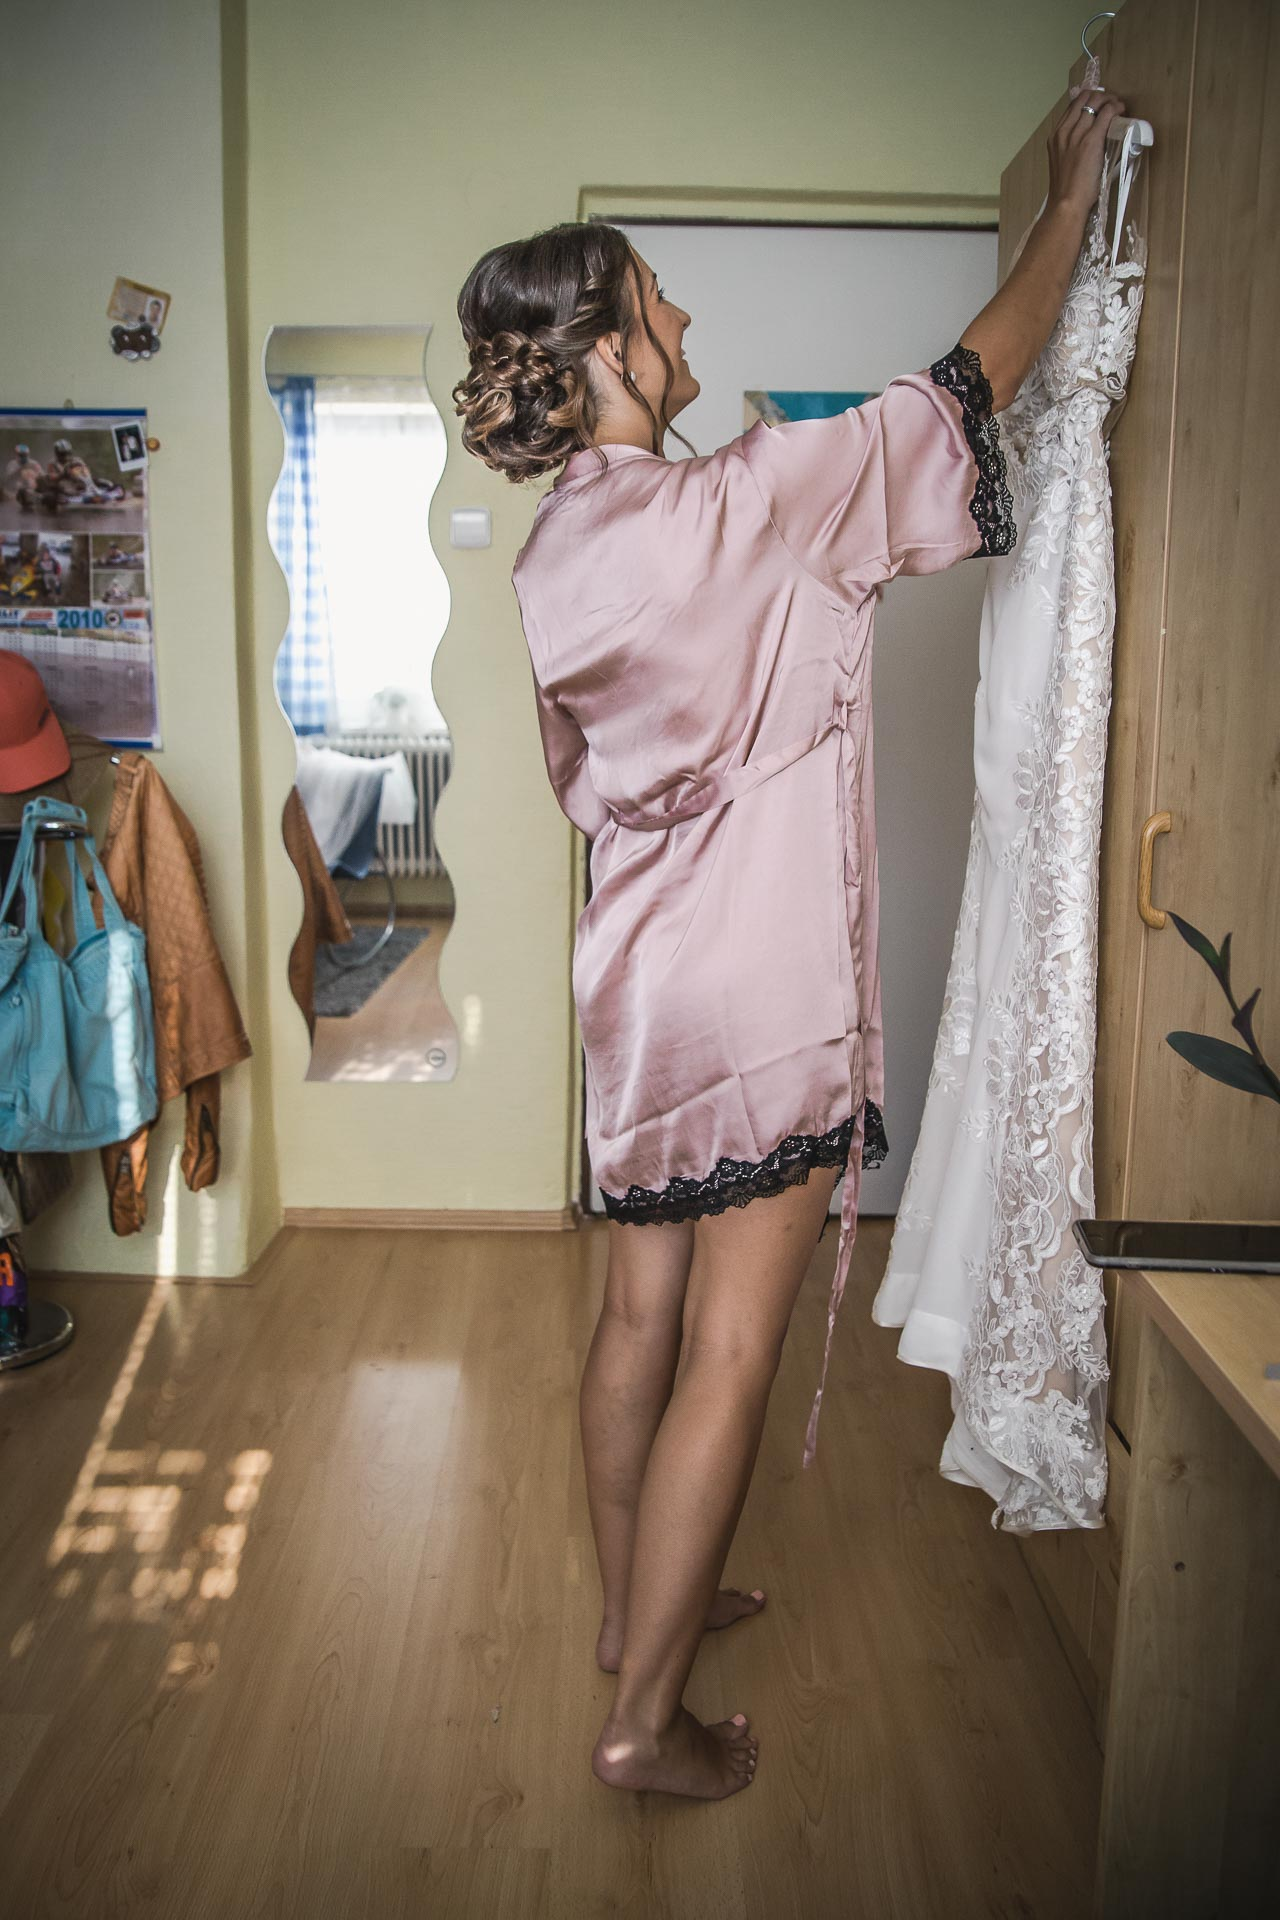 svatební-fotograf-wedding-svatebni-video-orlík-vltava-kostel-statek-stodola-boho-svatba-Beautyfoto-19